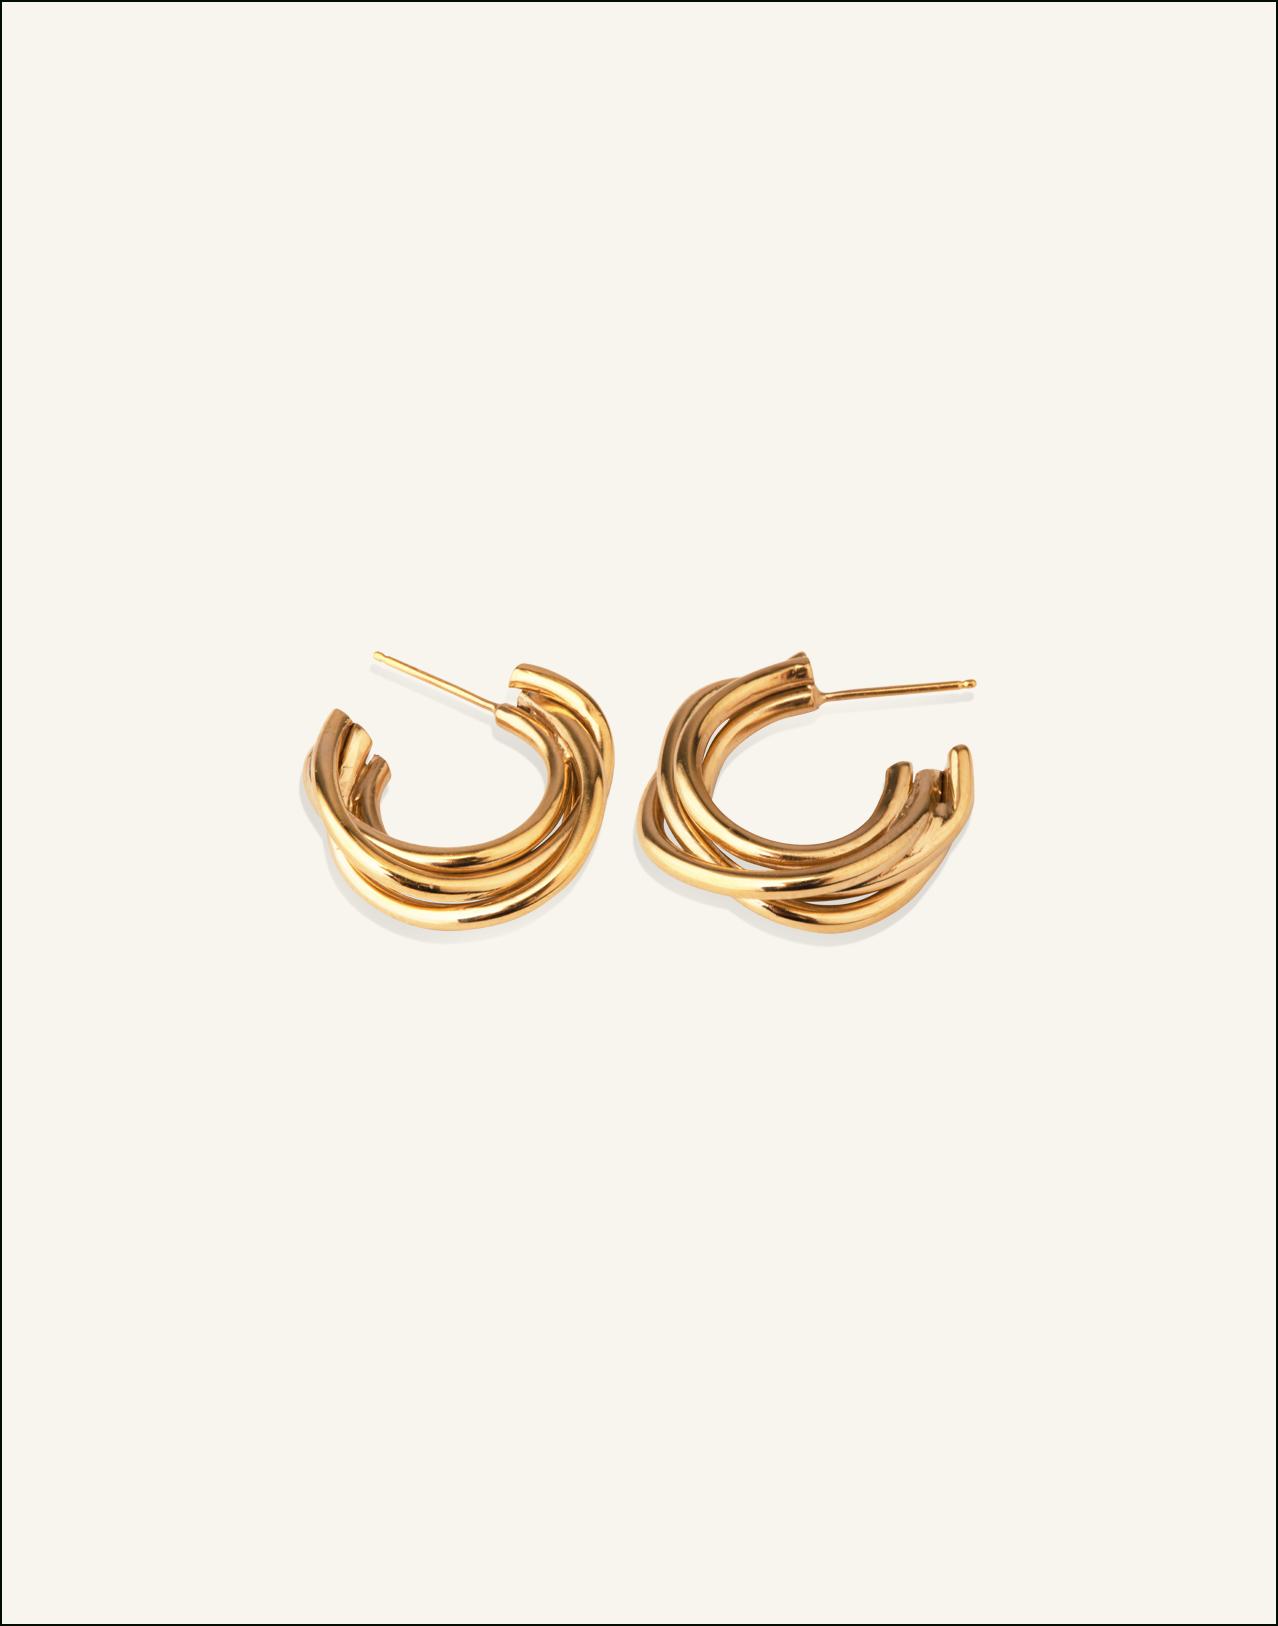 Completedworks-Earrings-An-Encounter-4-1.jpg